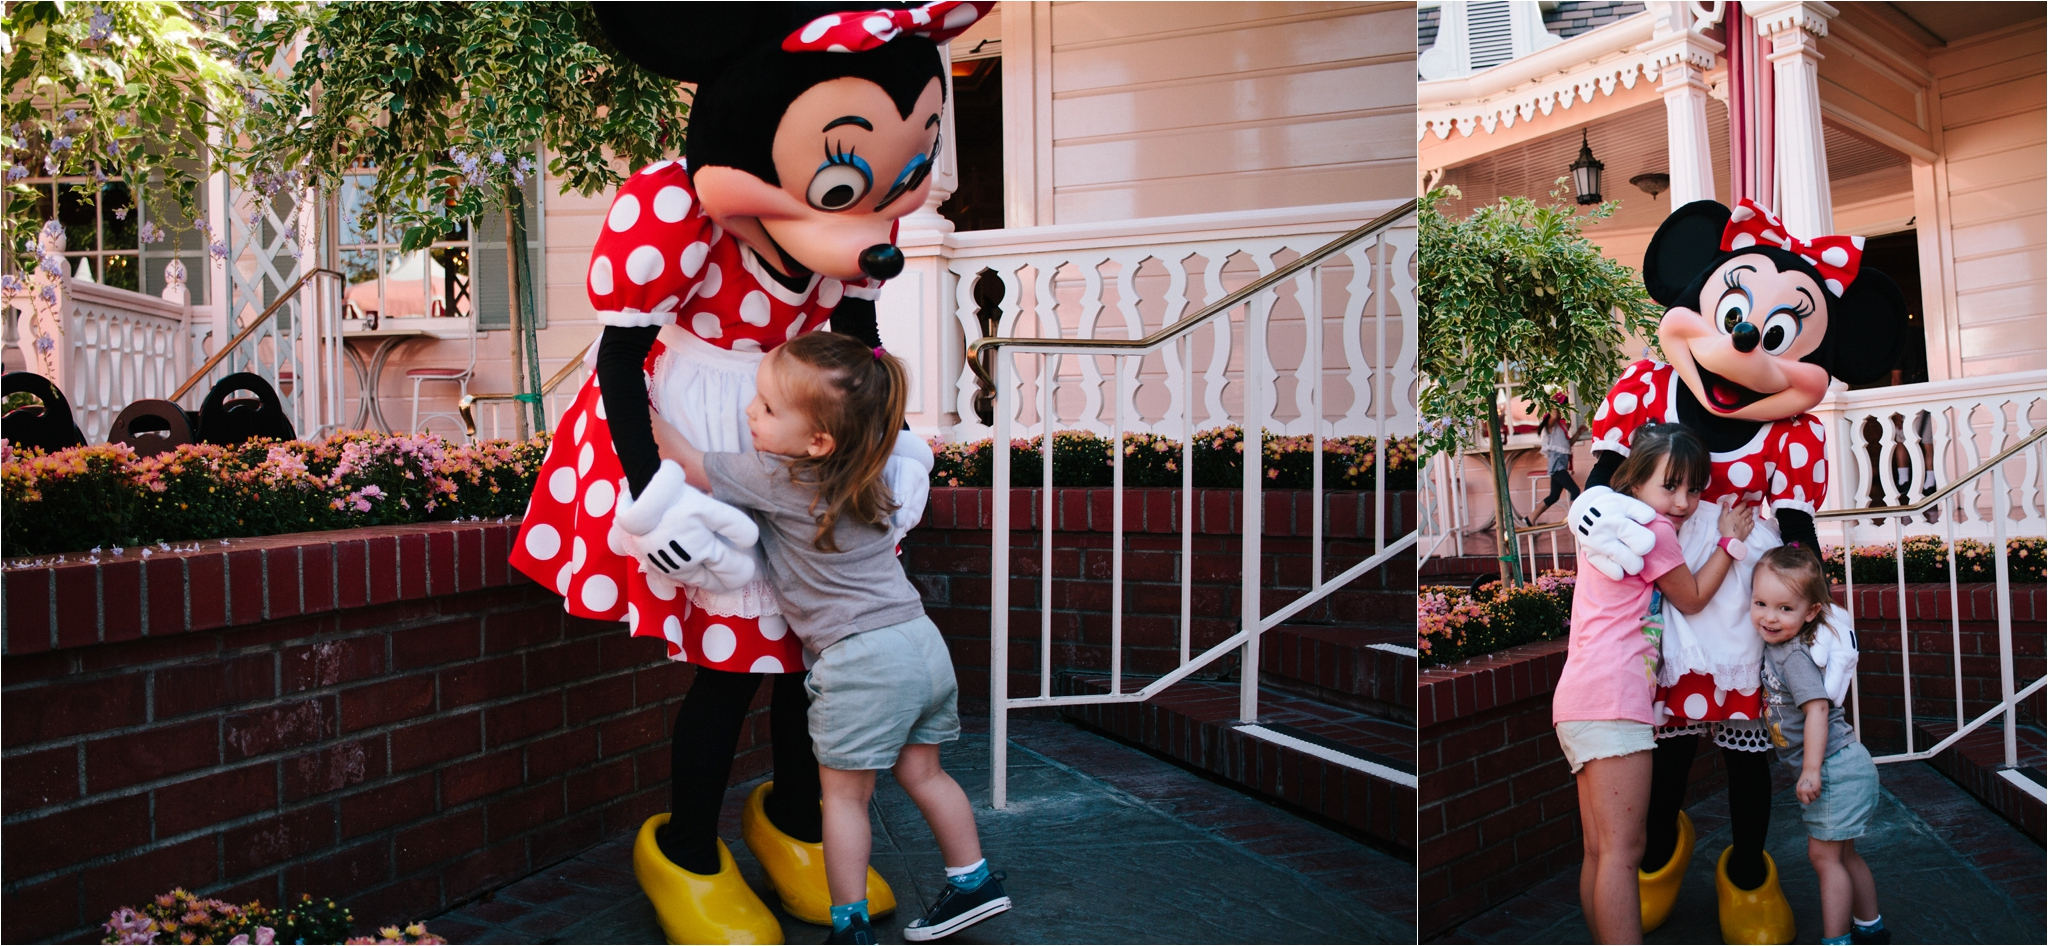 Disneylandroundtwopersonalimages_0008.jpg